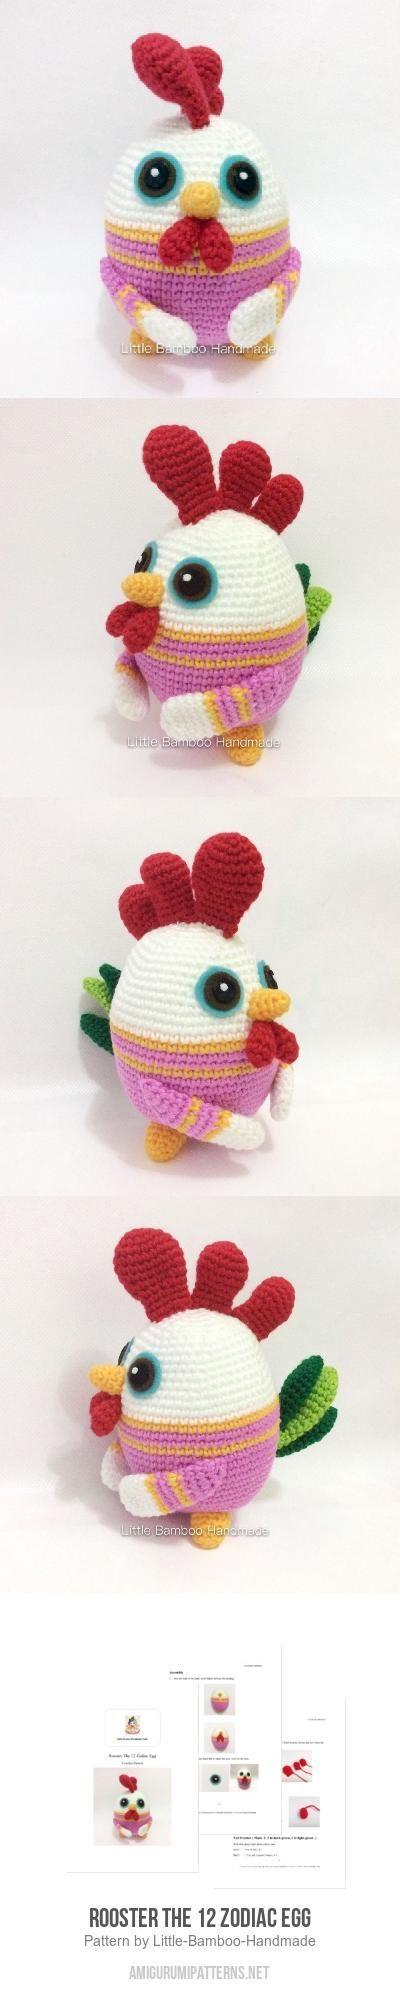 Rooster The 12 Zodiac Egg amigurumi pattern